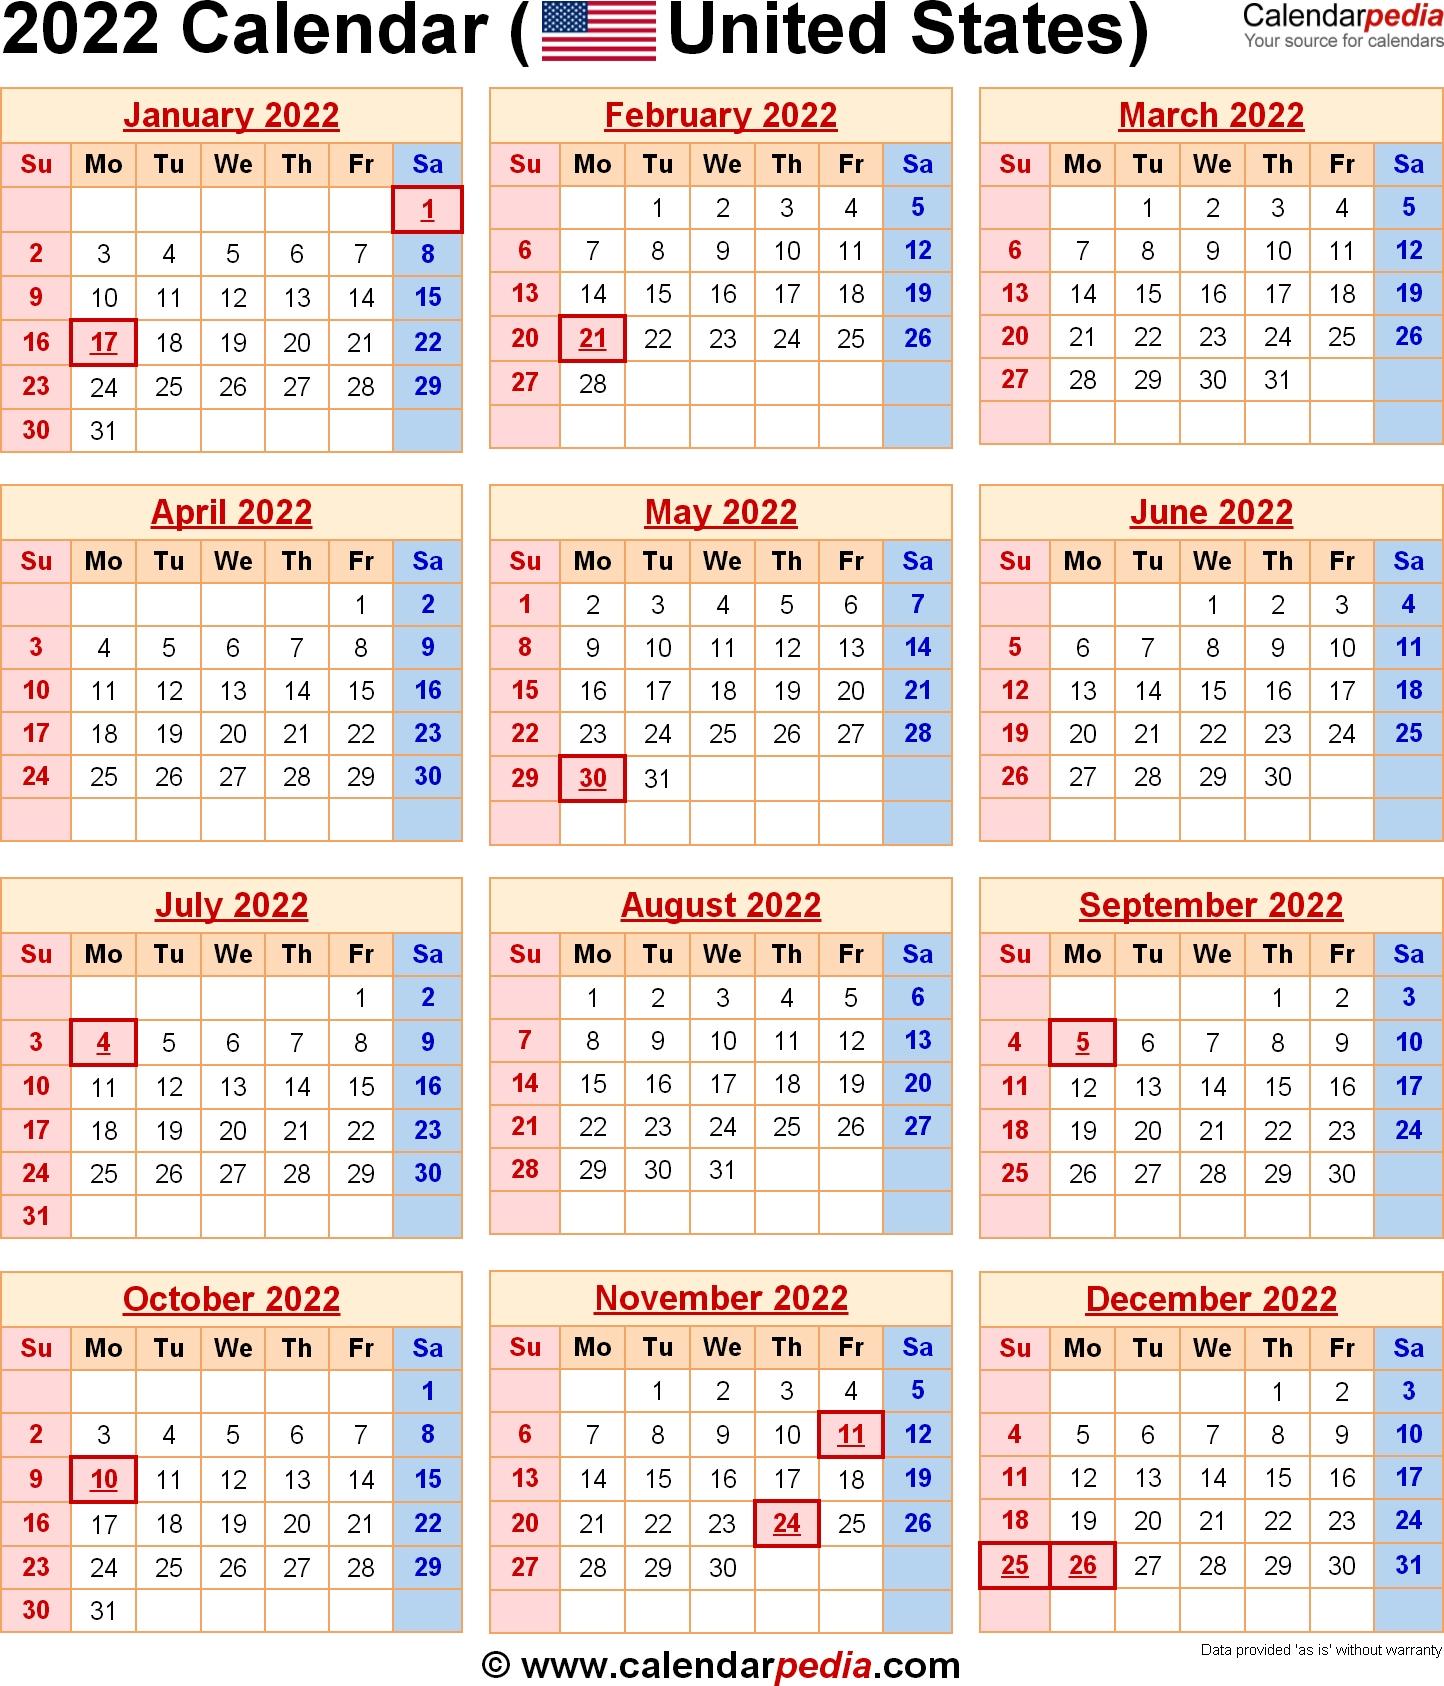 2022 Calendar With Federal Holidays